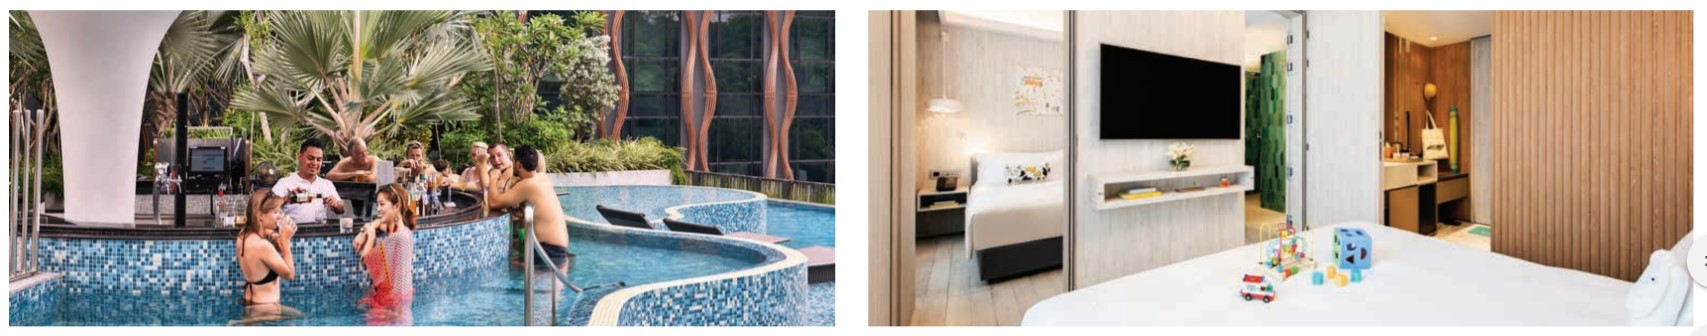 Village Hotel Sentosa Singapore